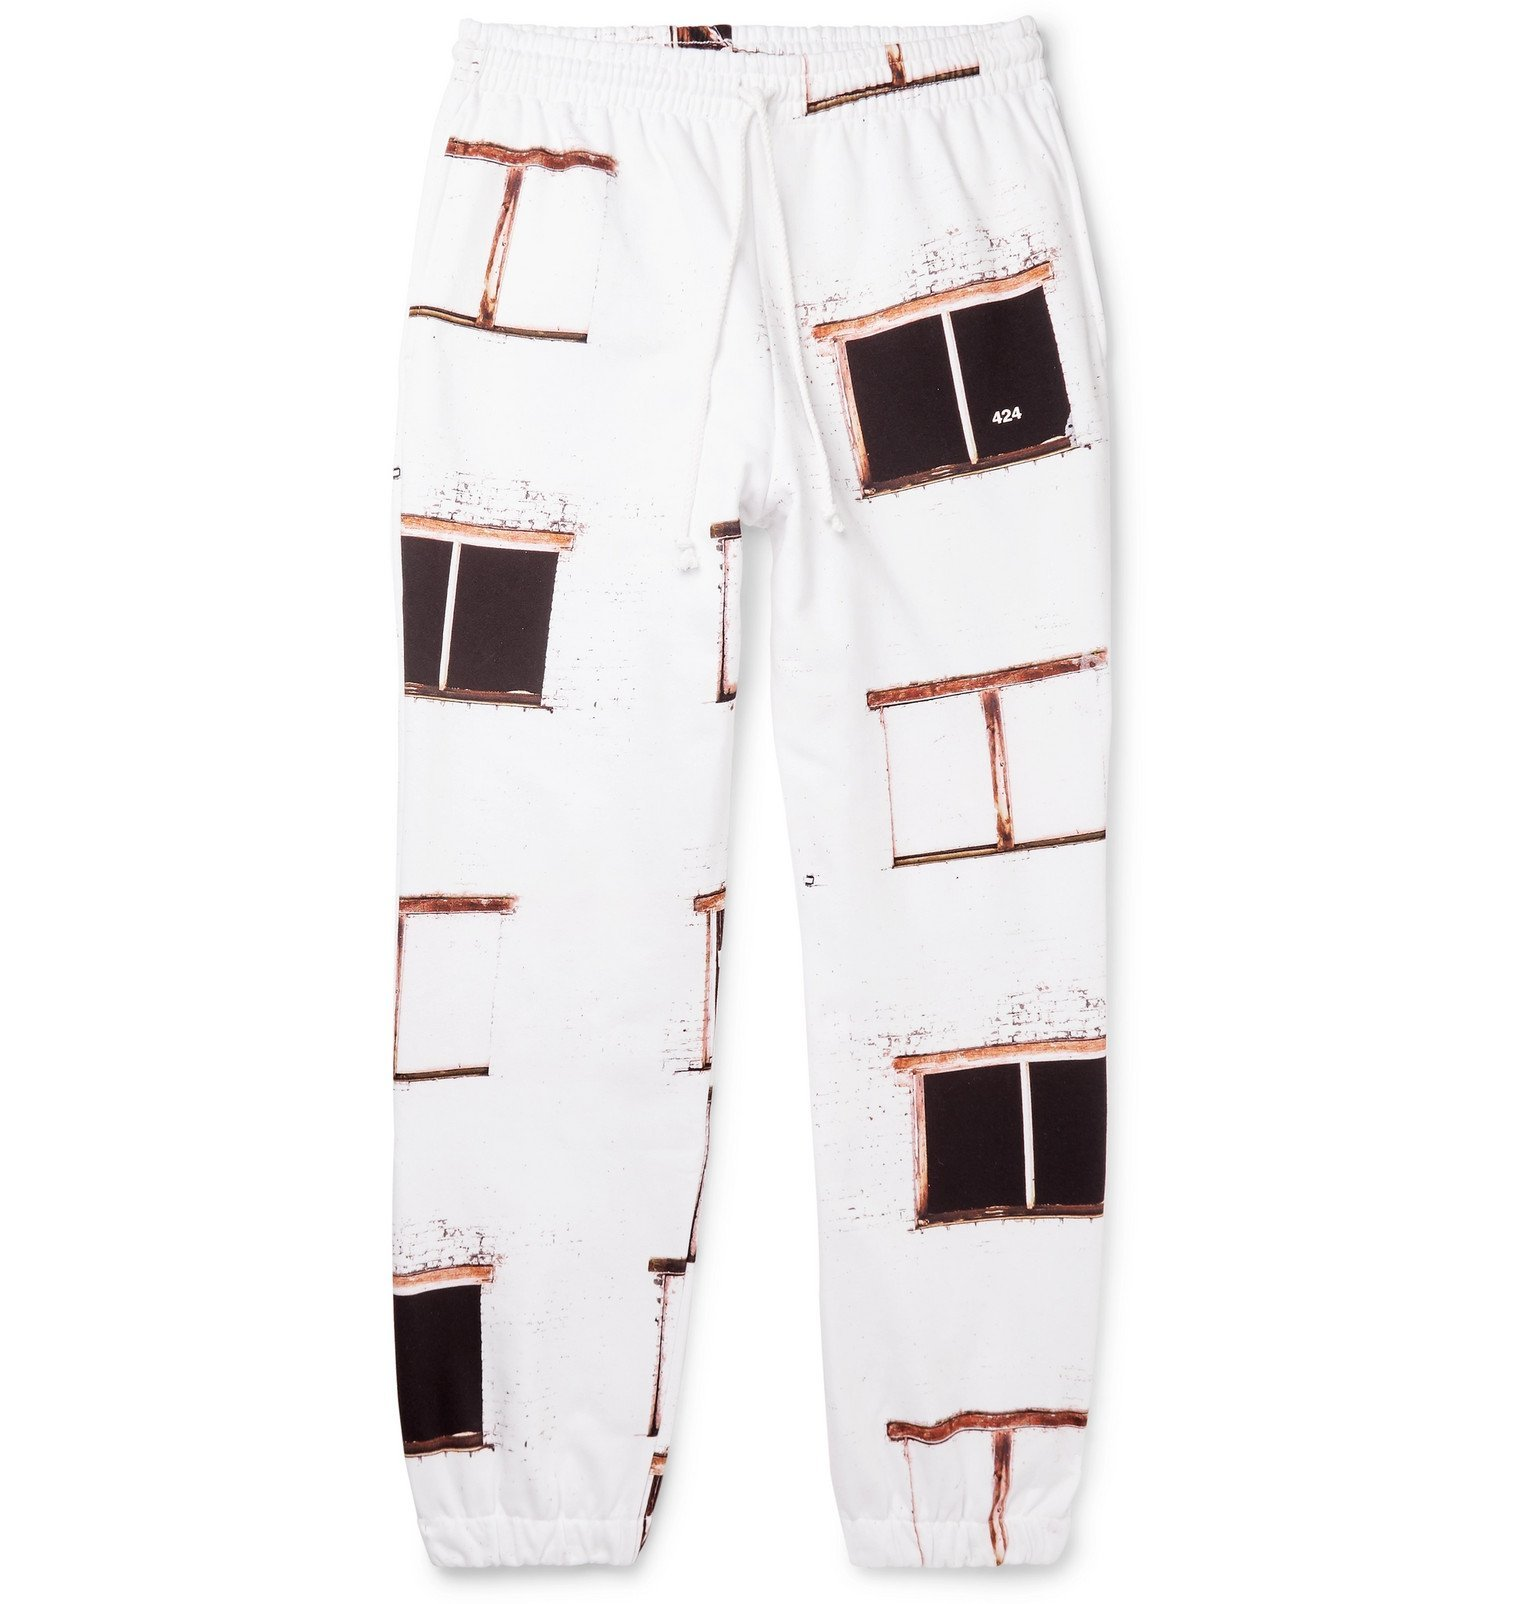 Photo: 424 - Printed Fleece-Back Cotton-Jersey Track Pants - White